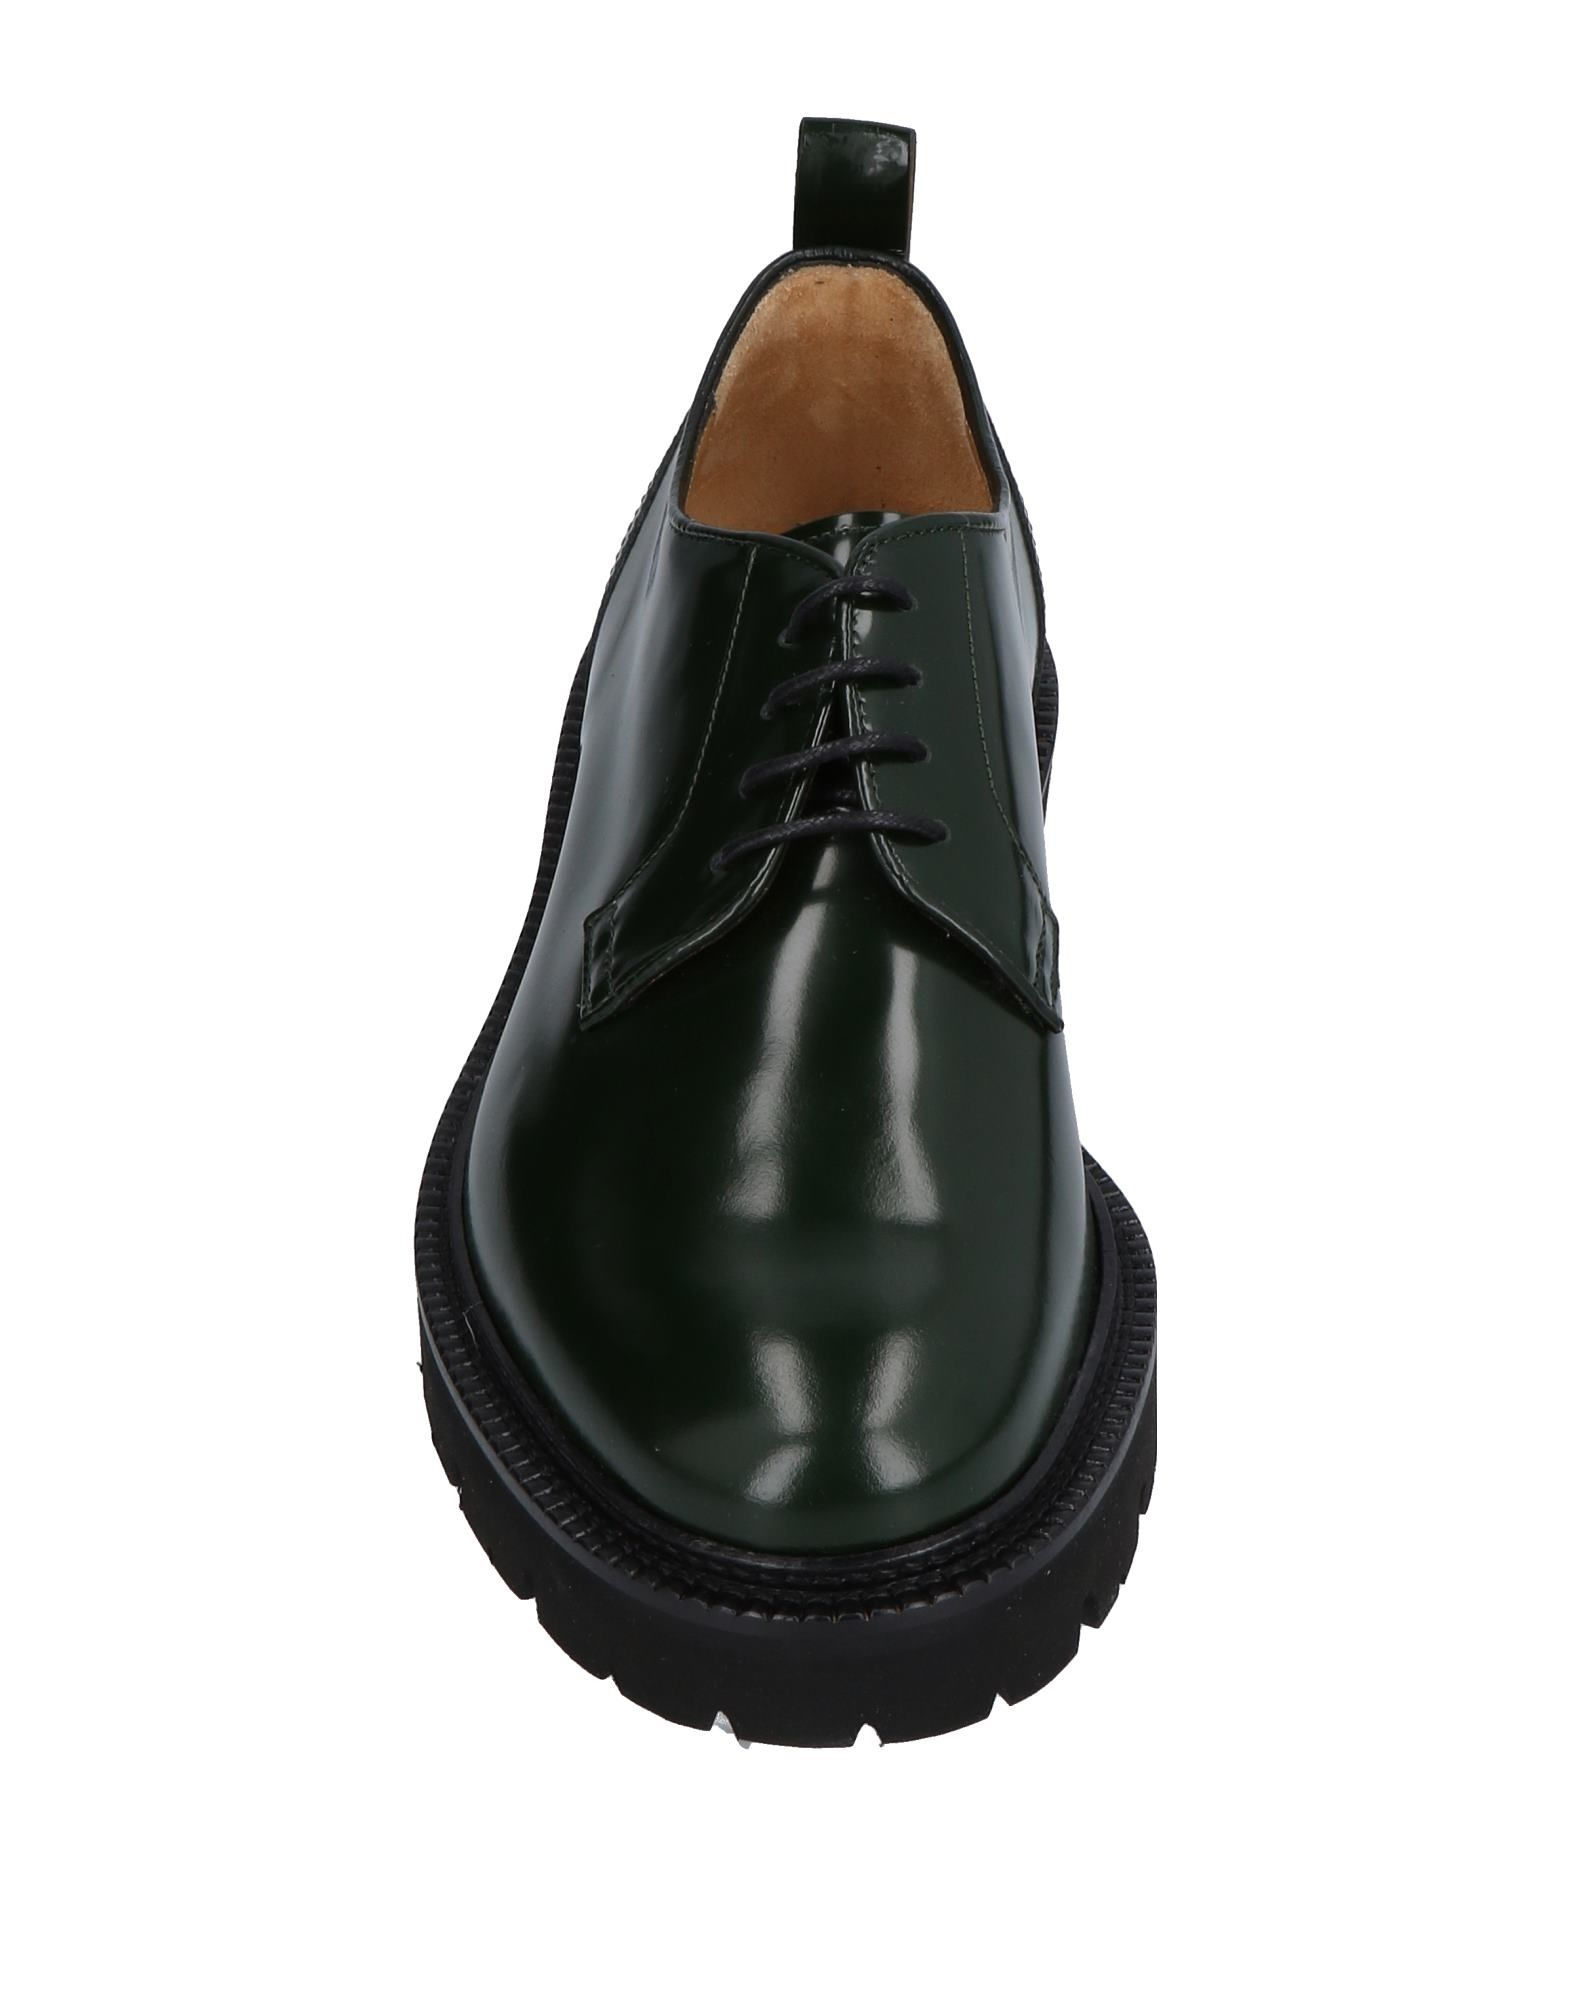 Msgm Schnürschuhe Herren  11494036WV Schuhe Gute Qualität beliebte Schuhe 11494036WV 16e466